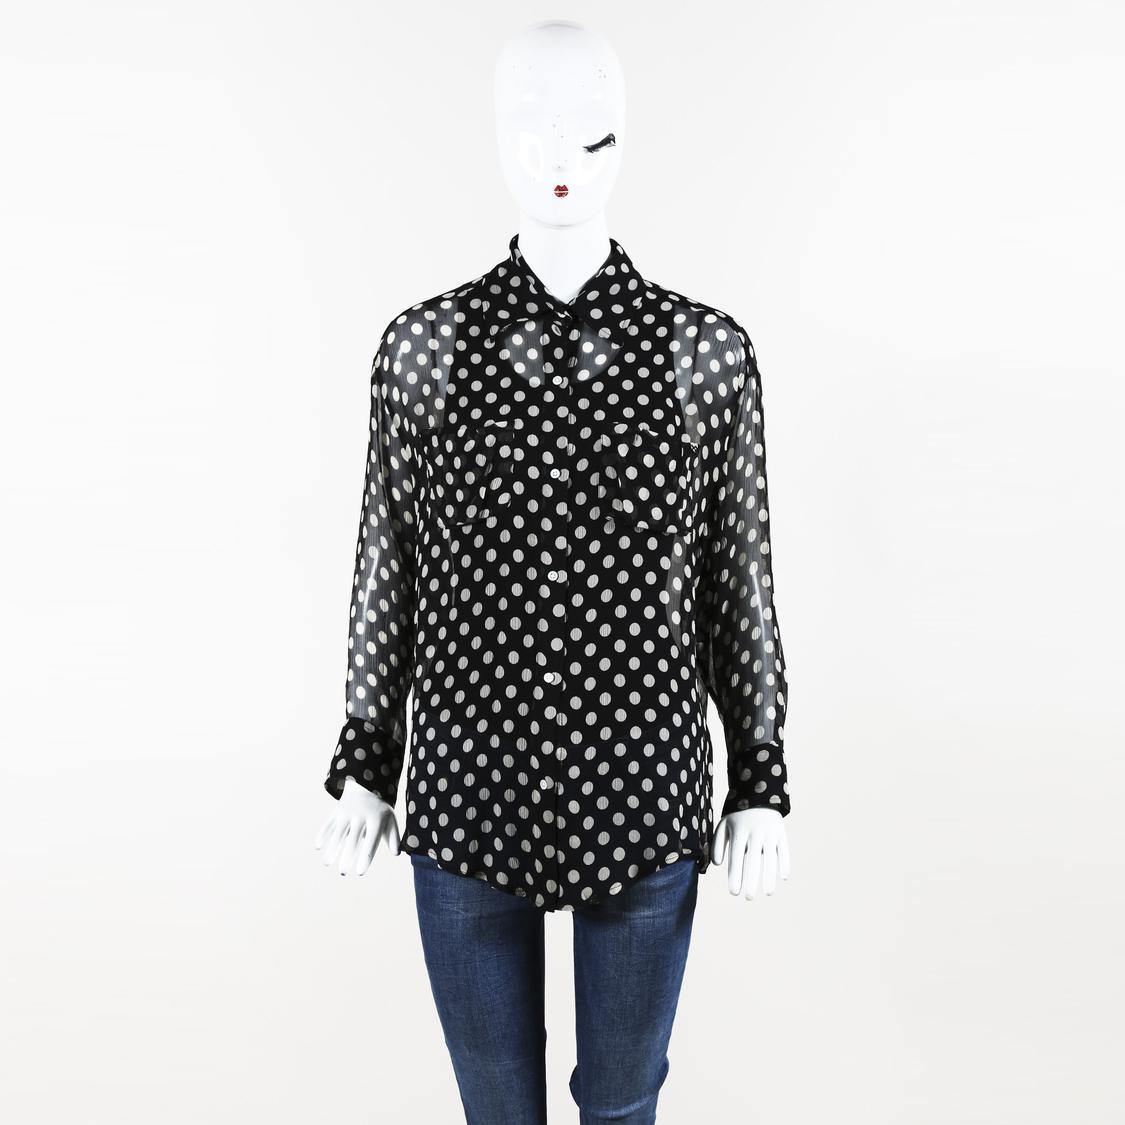 6ba3e73fc1240 Lyst - Elizabeth and James Polka Dot Silk Shirt in Black